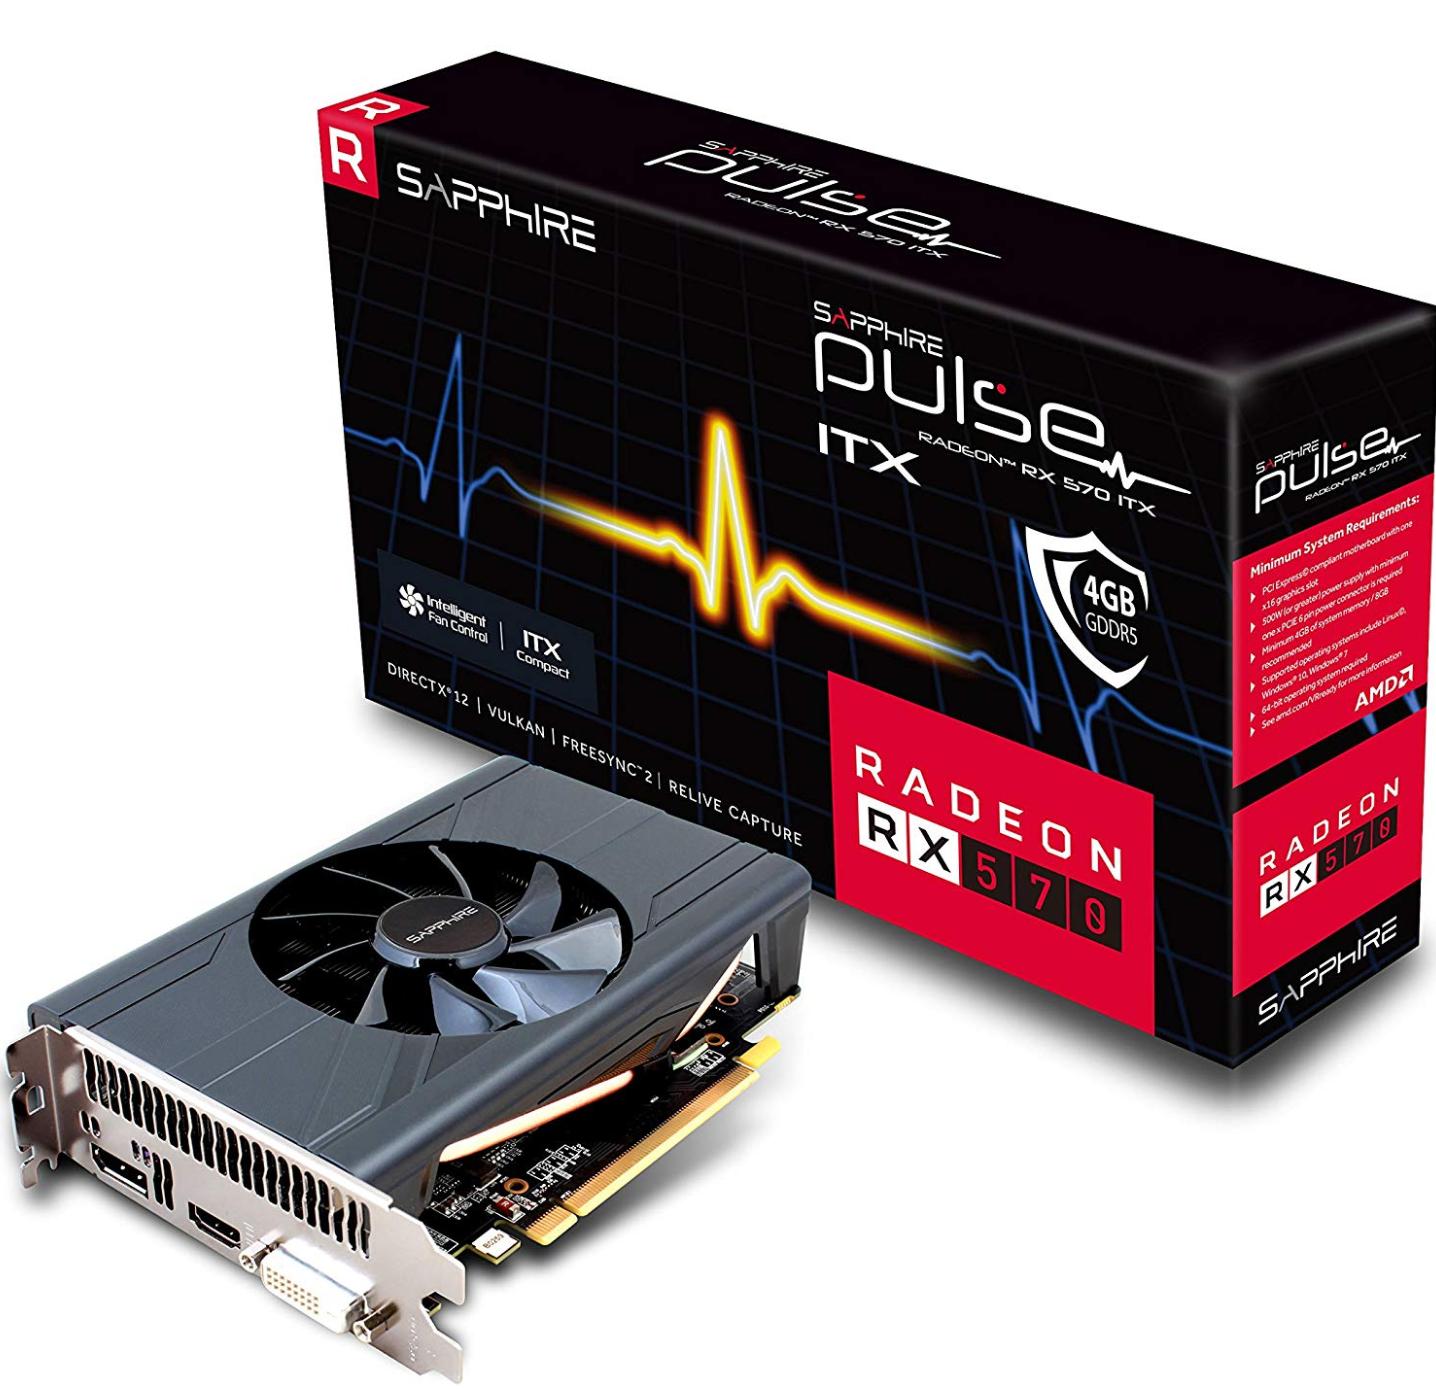 Sapphire Radeon Rx 570 4GB. Amazon.it